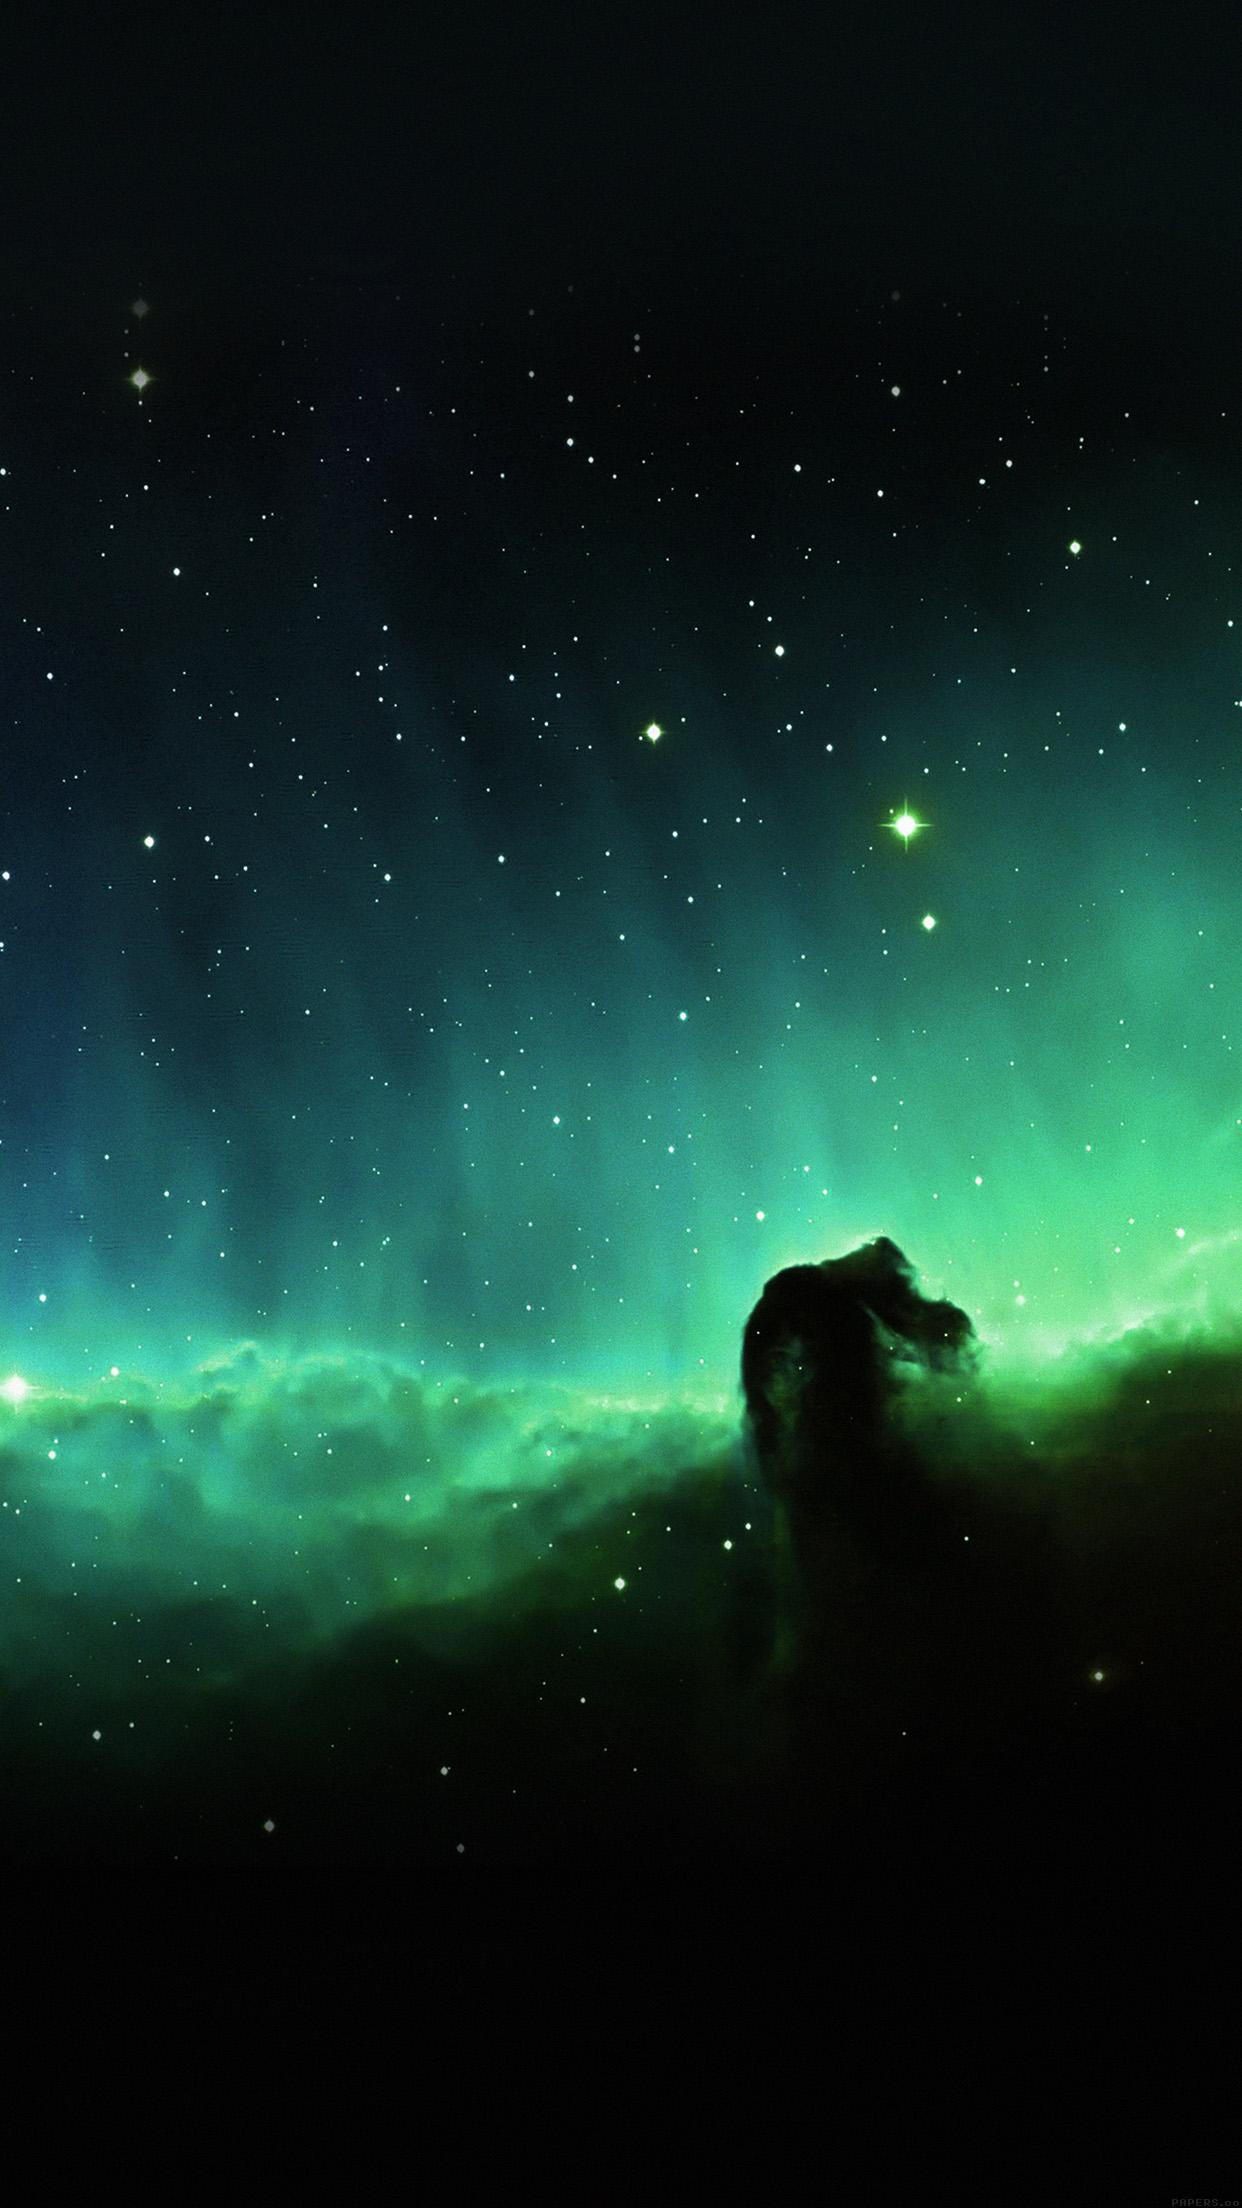 Mj11 horse head blue nebula sky space stars - Space wallpaper phone ...